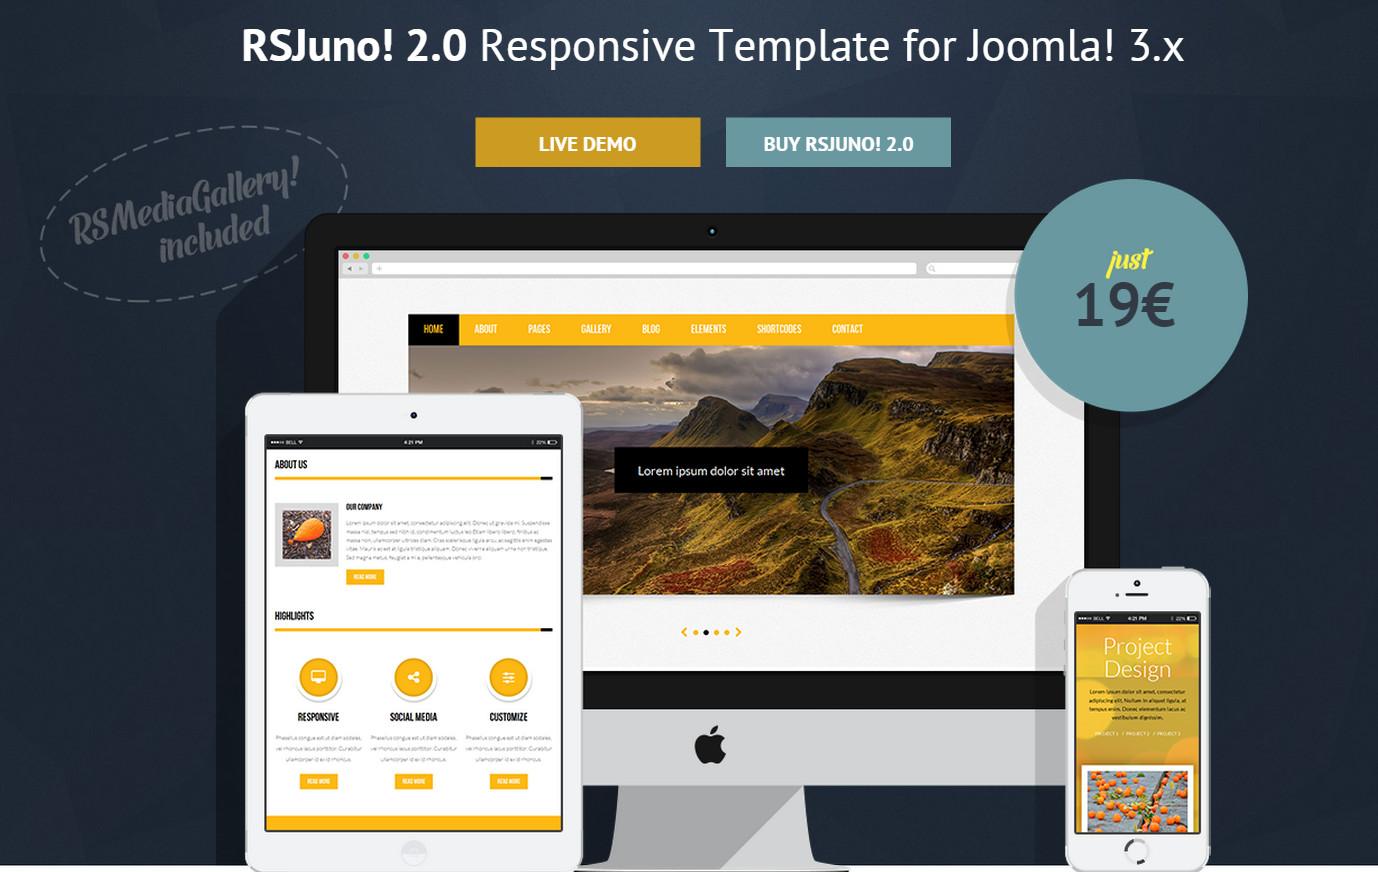 RSJuno! 2.0 – responsive template for Joomla CMS